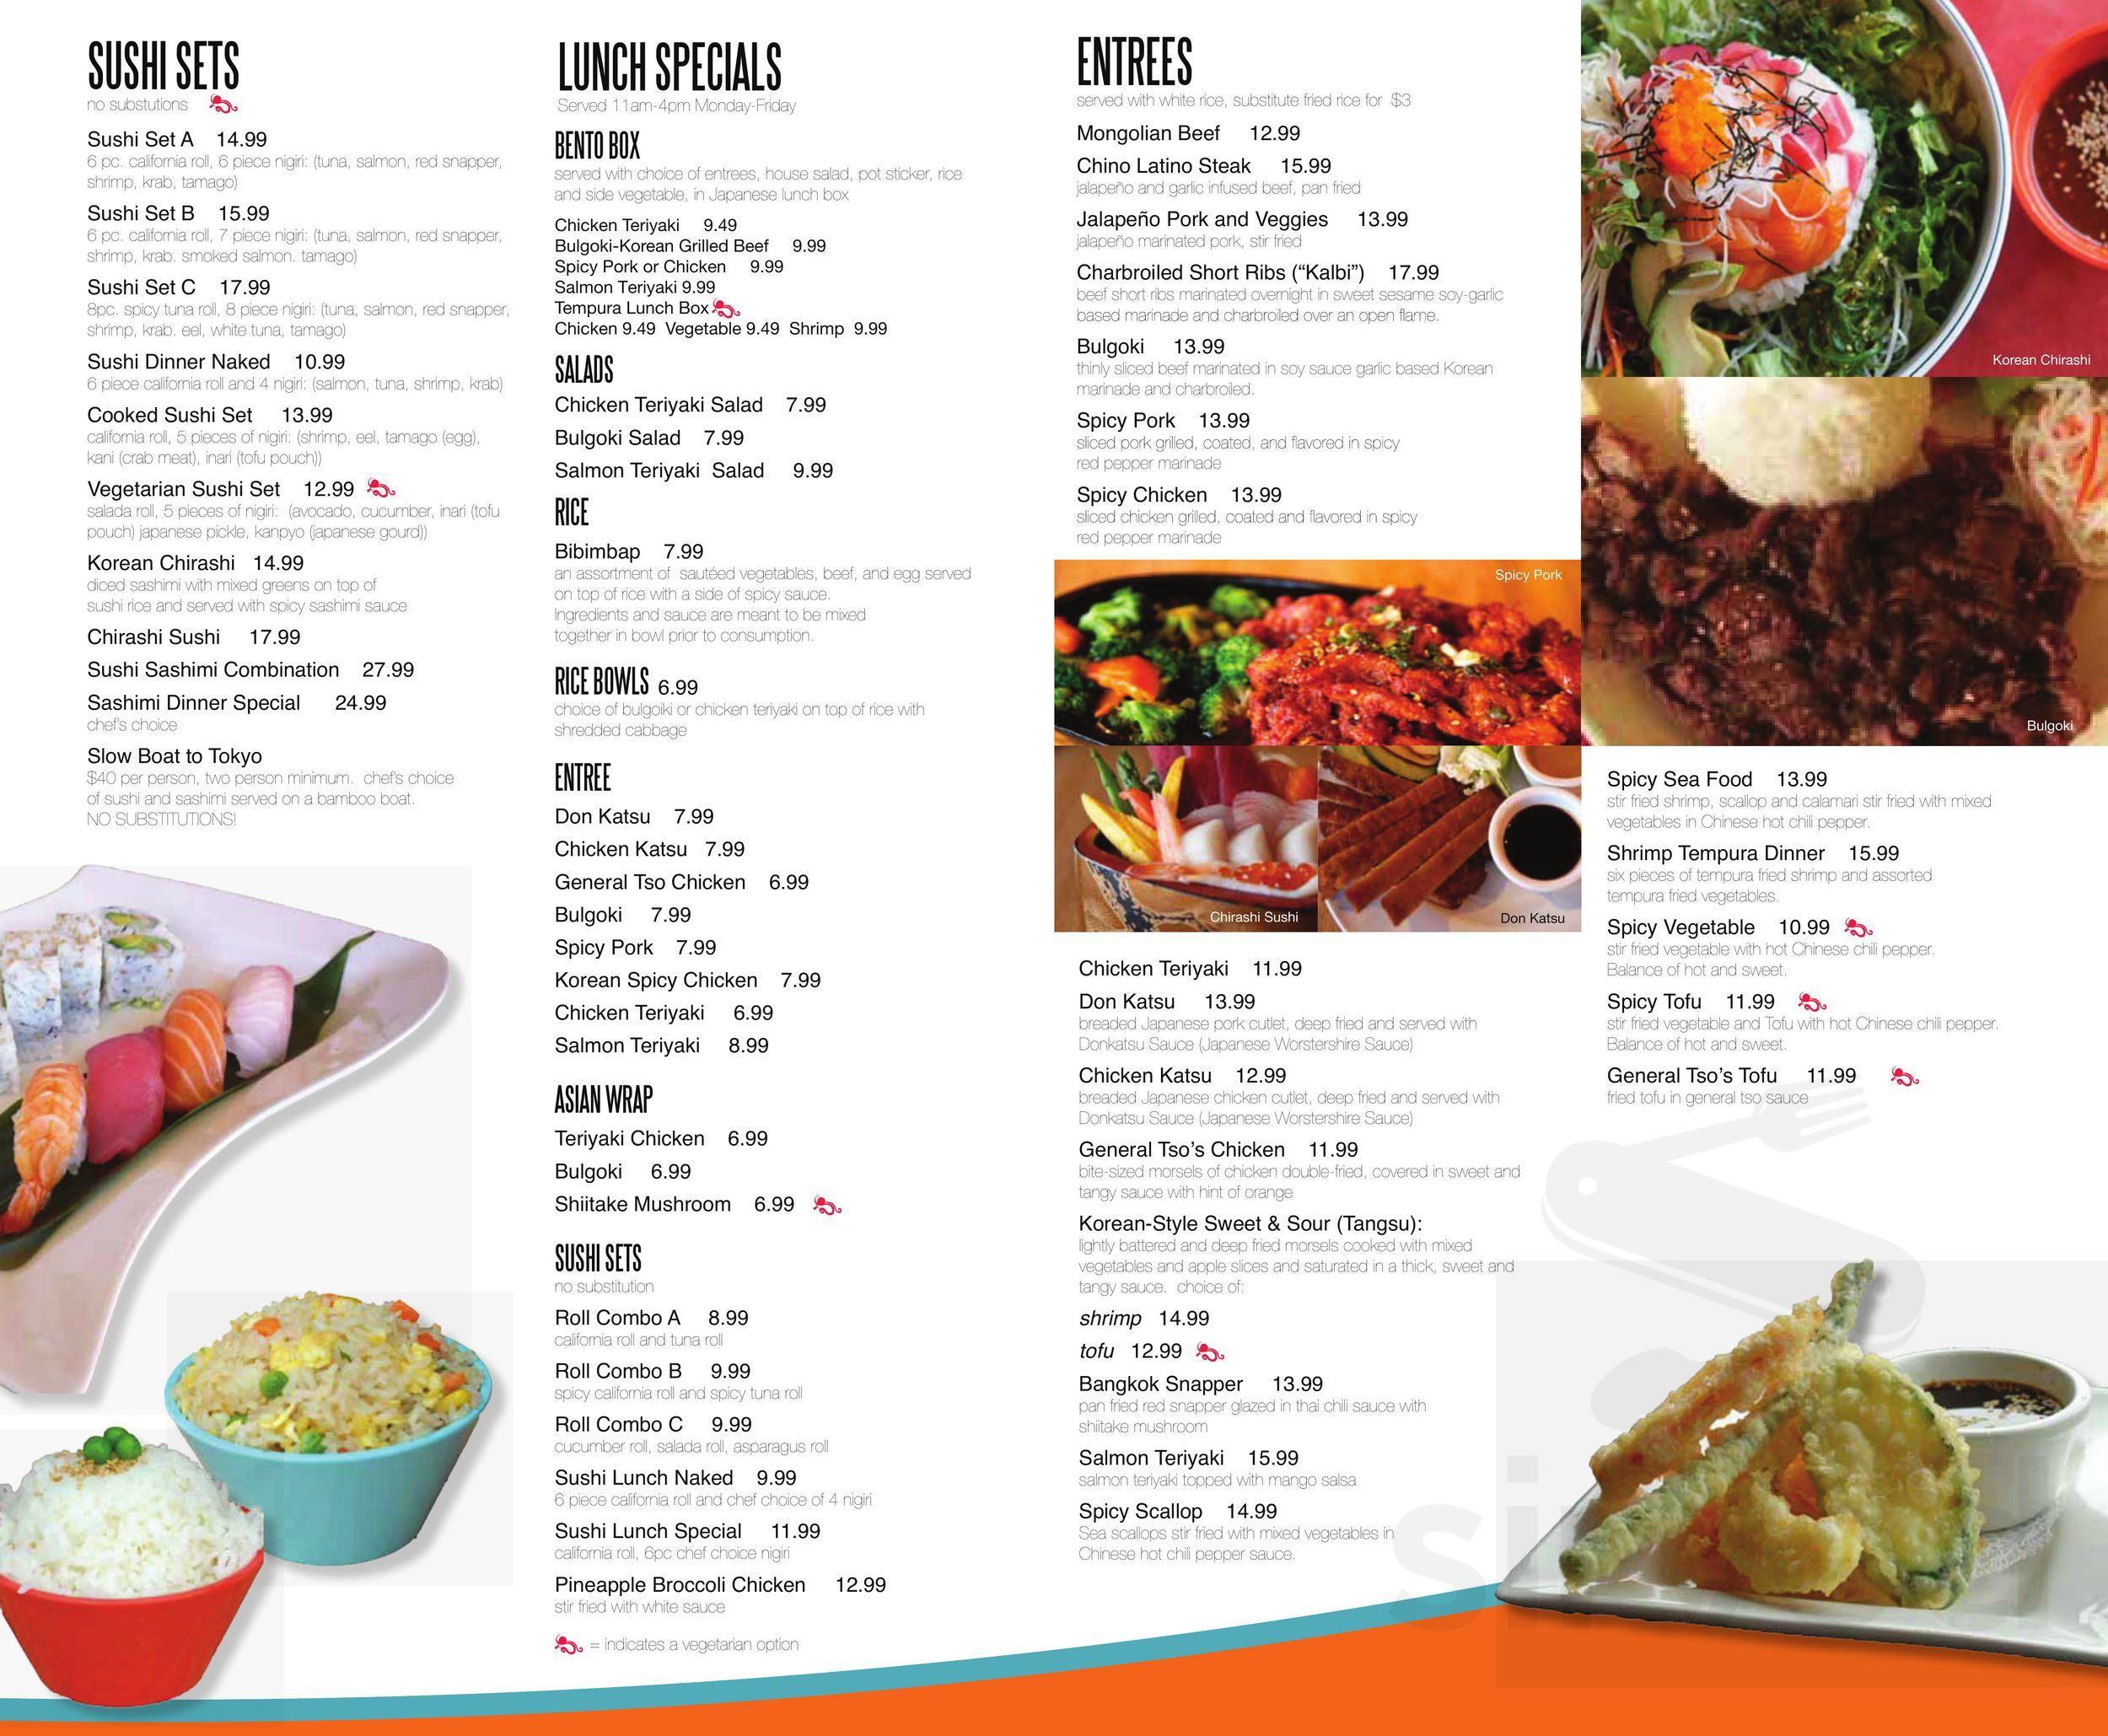 Naked Tchopstix menu in Fort Wayne, Indiana, USA